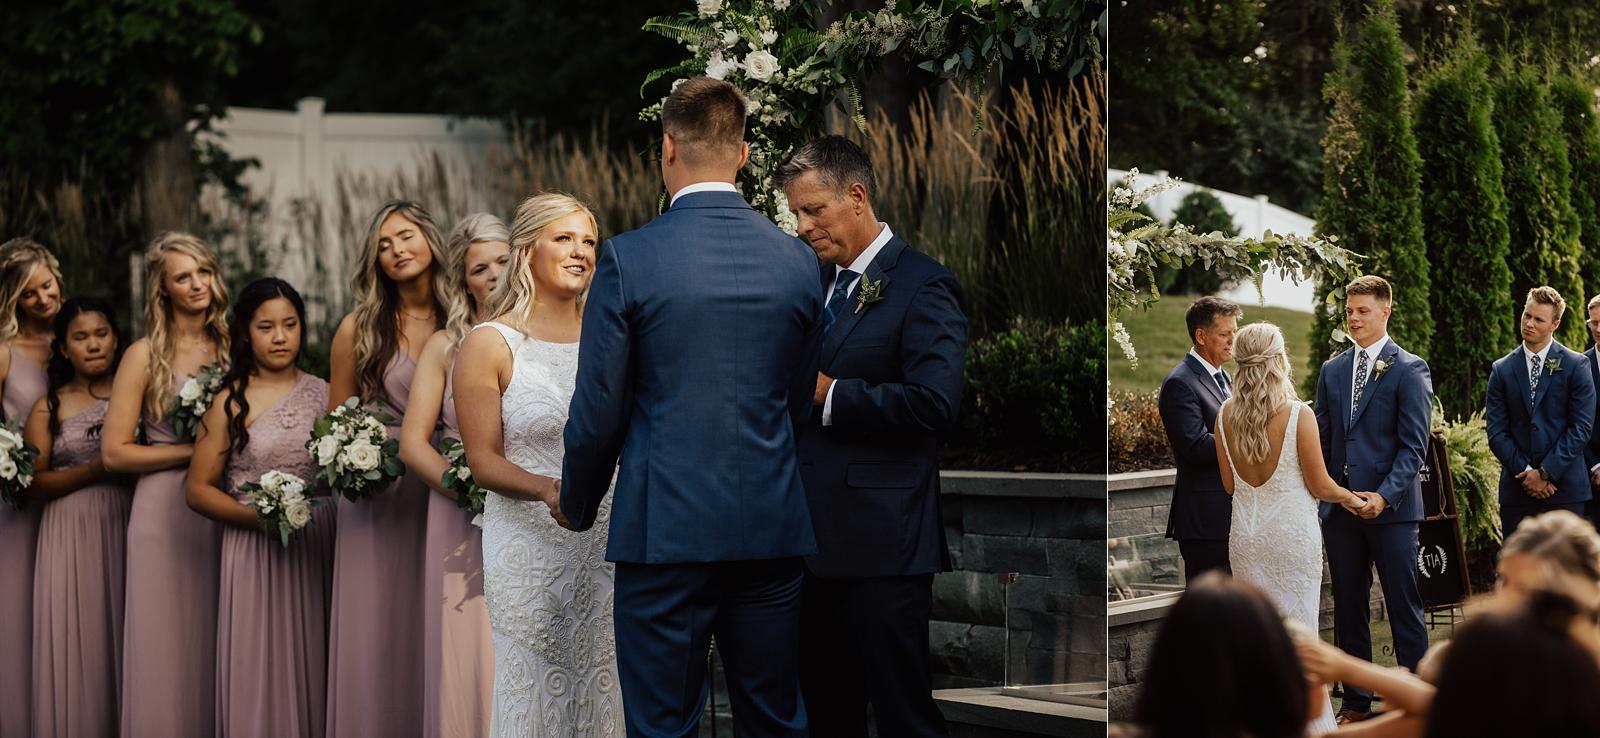 Anna & Trey Modern Minneapolis Wedding at The Hutton House_0721.jpg